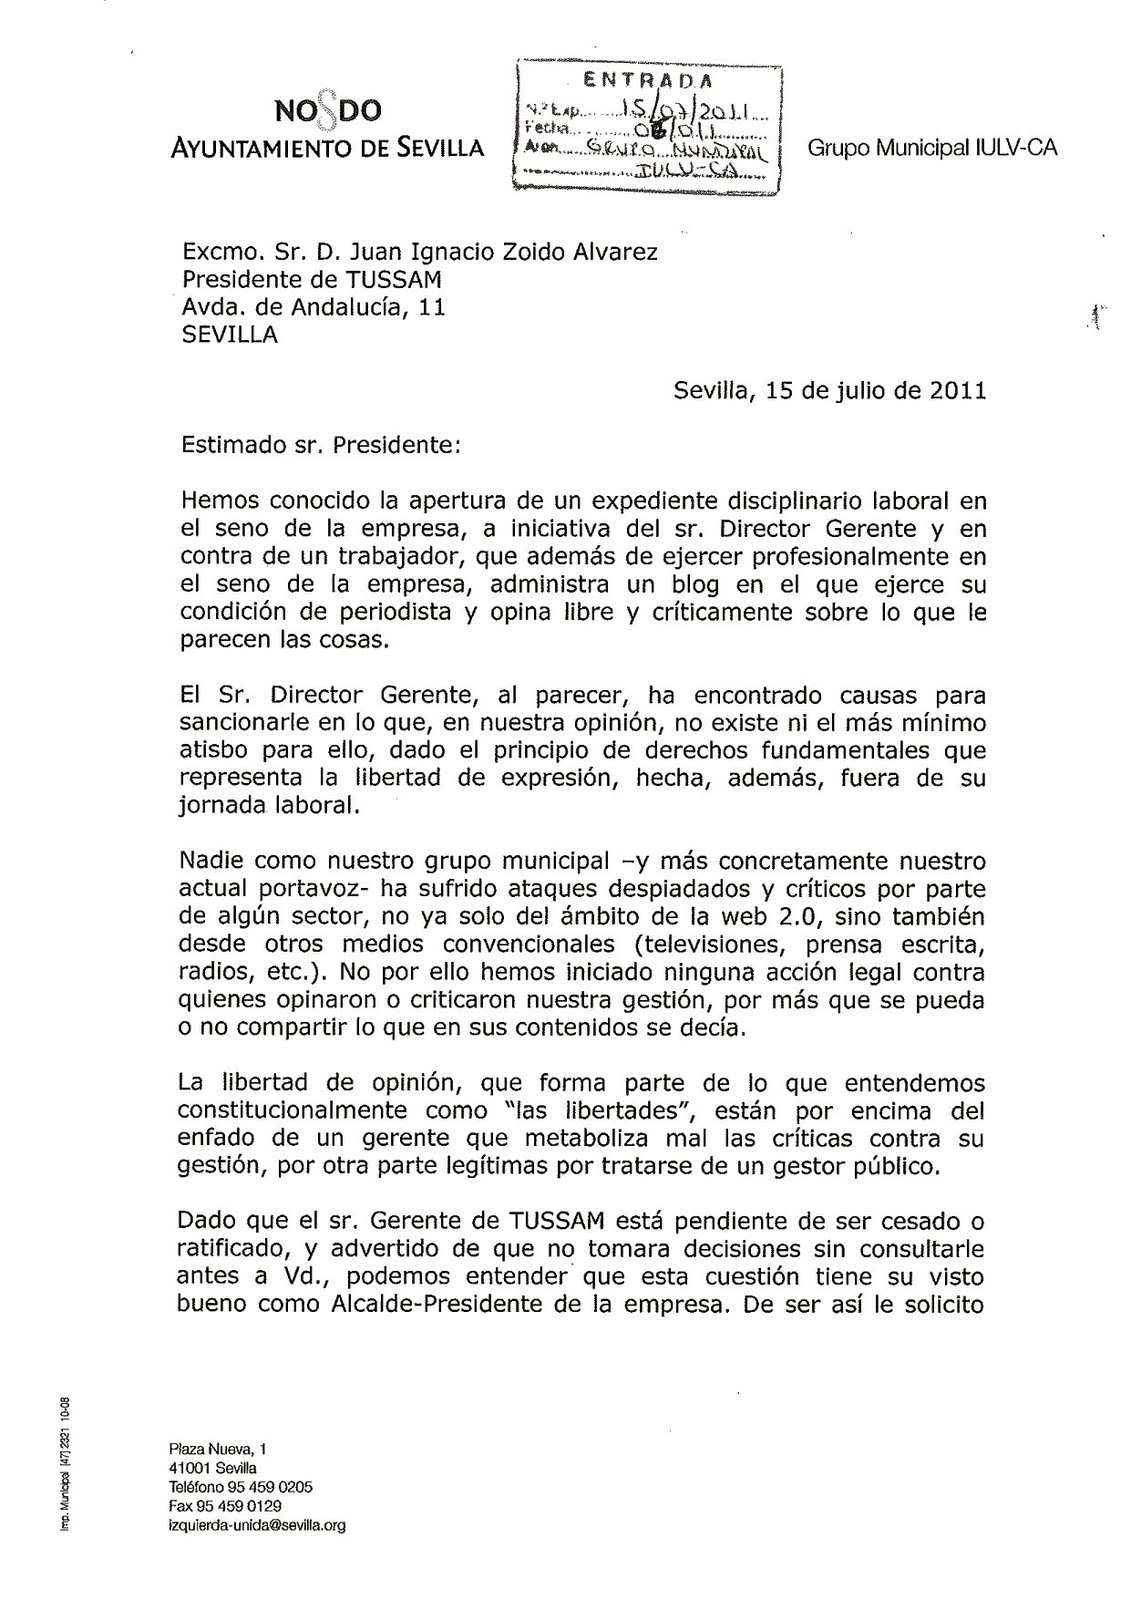 Gregorio Verdugo [Periodista]: 1/07/11 - 1/08/11